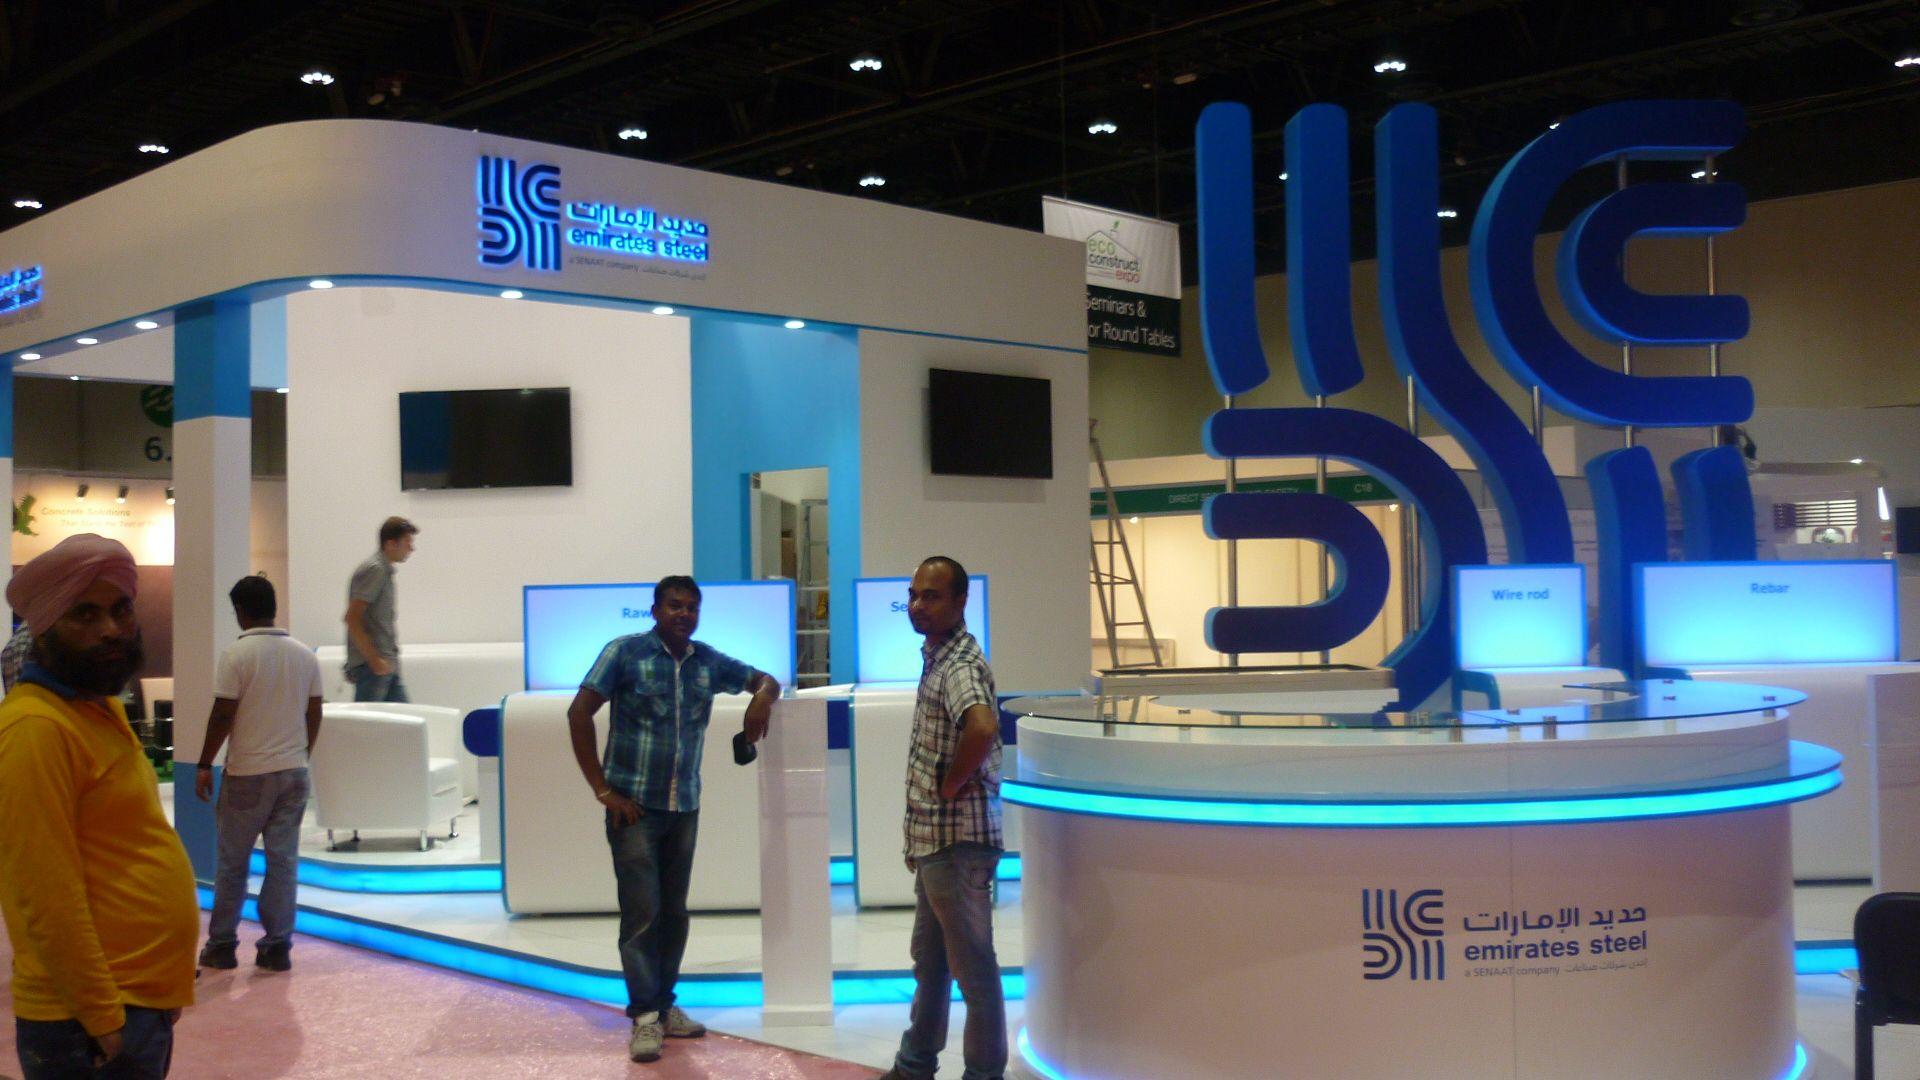 Warner international interior decoration llc for Hispano international decor llc abu dhabi